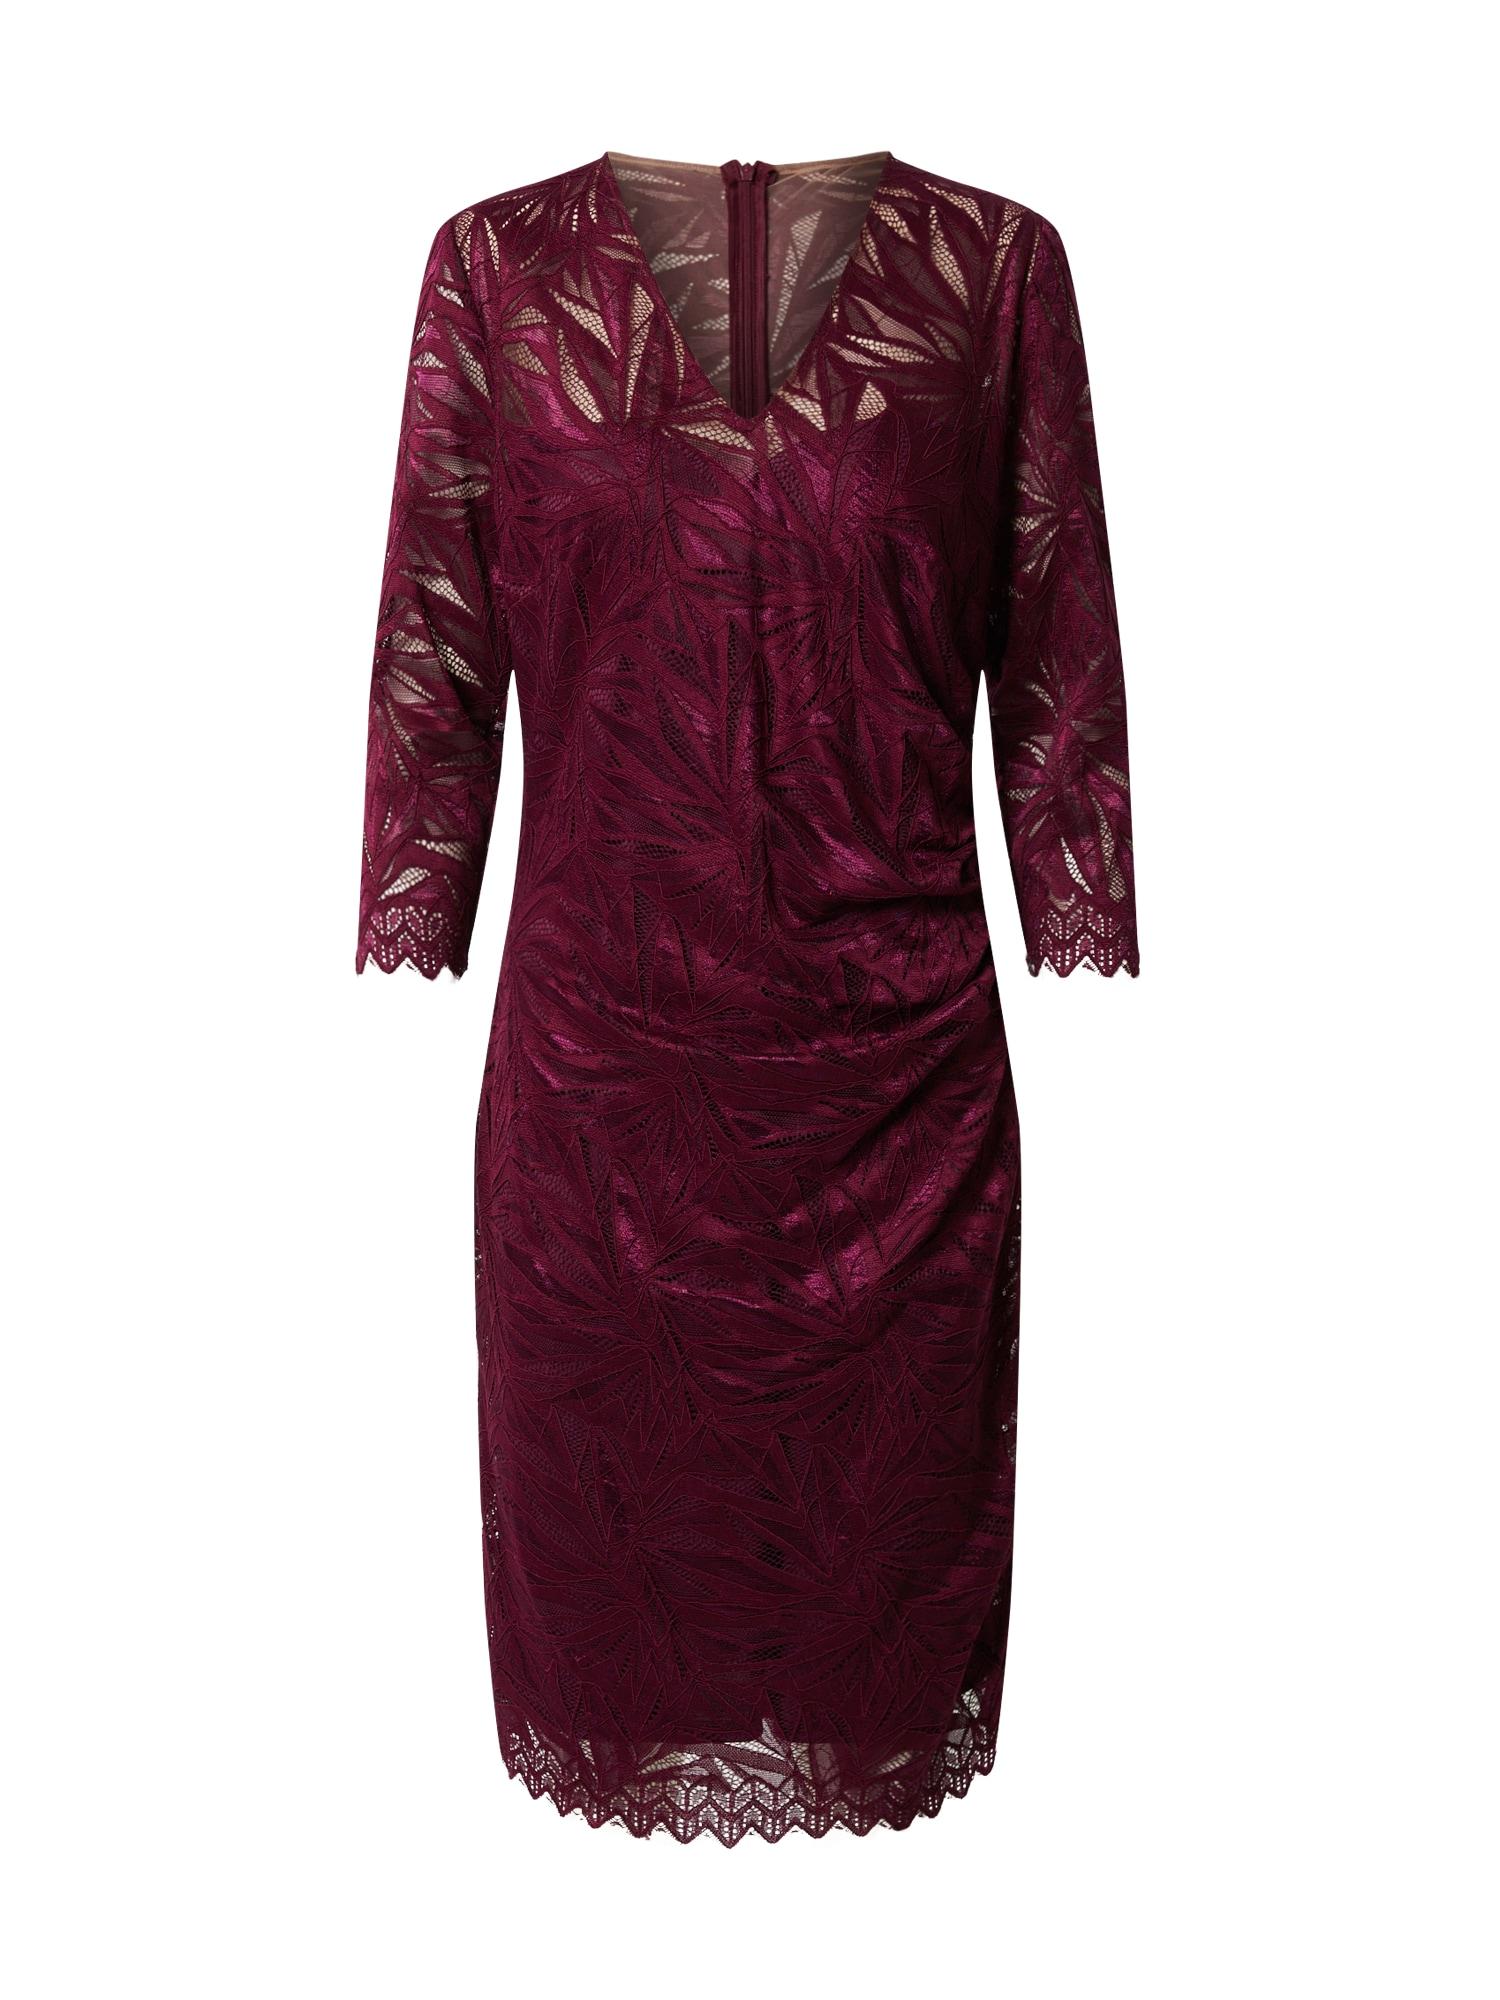 Vera Mont Suknelė vyšninė spalva